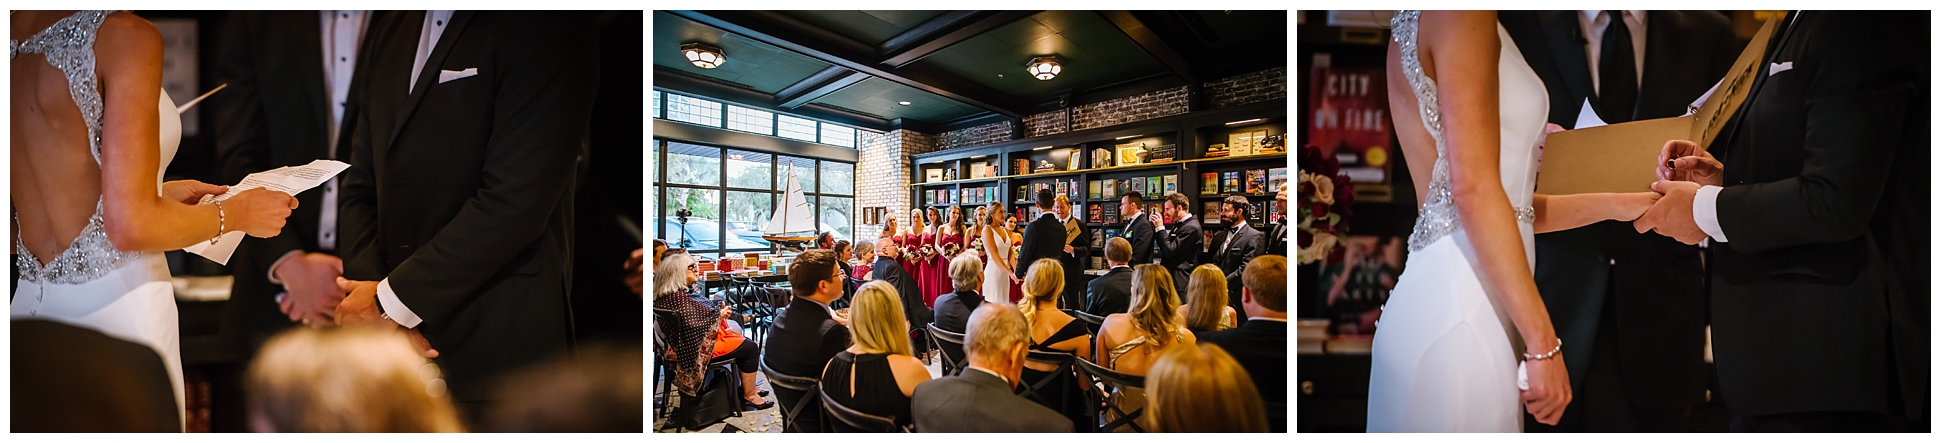 Oxford-exchange-wedding-photogapher-garland-candels-bookstore-burgandy-botanica_0051.jpg